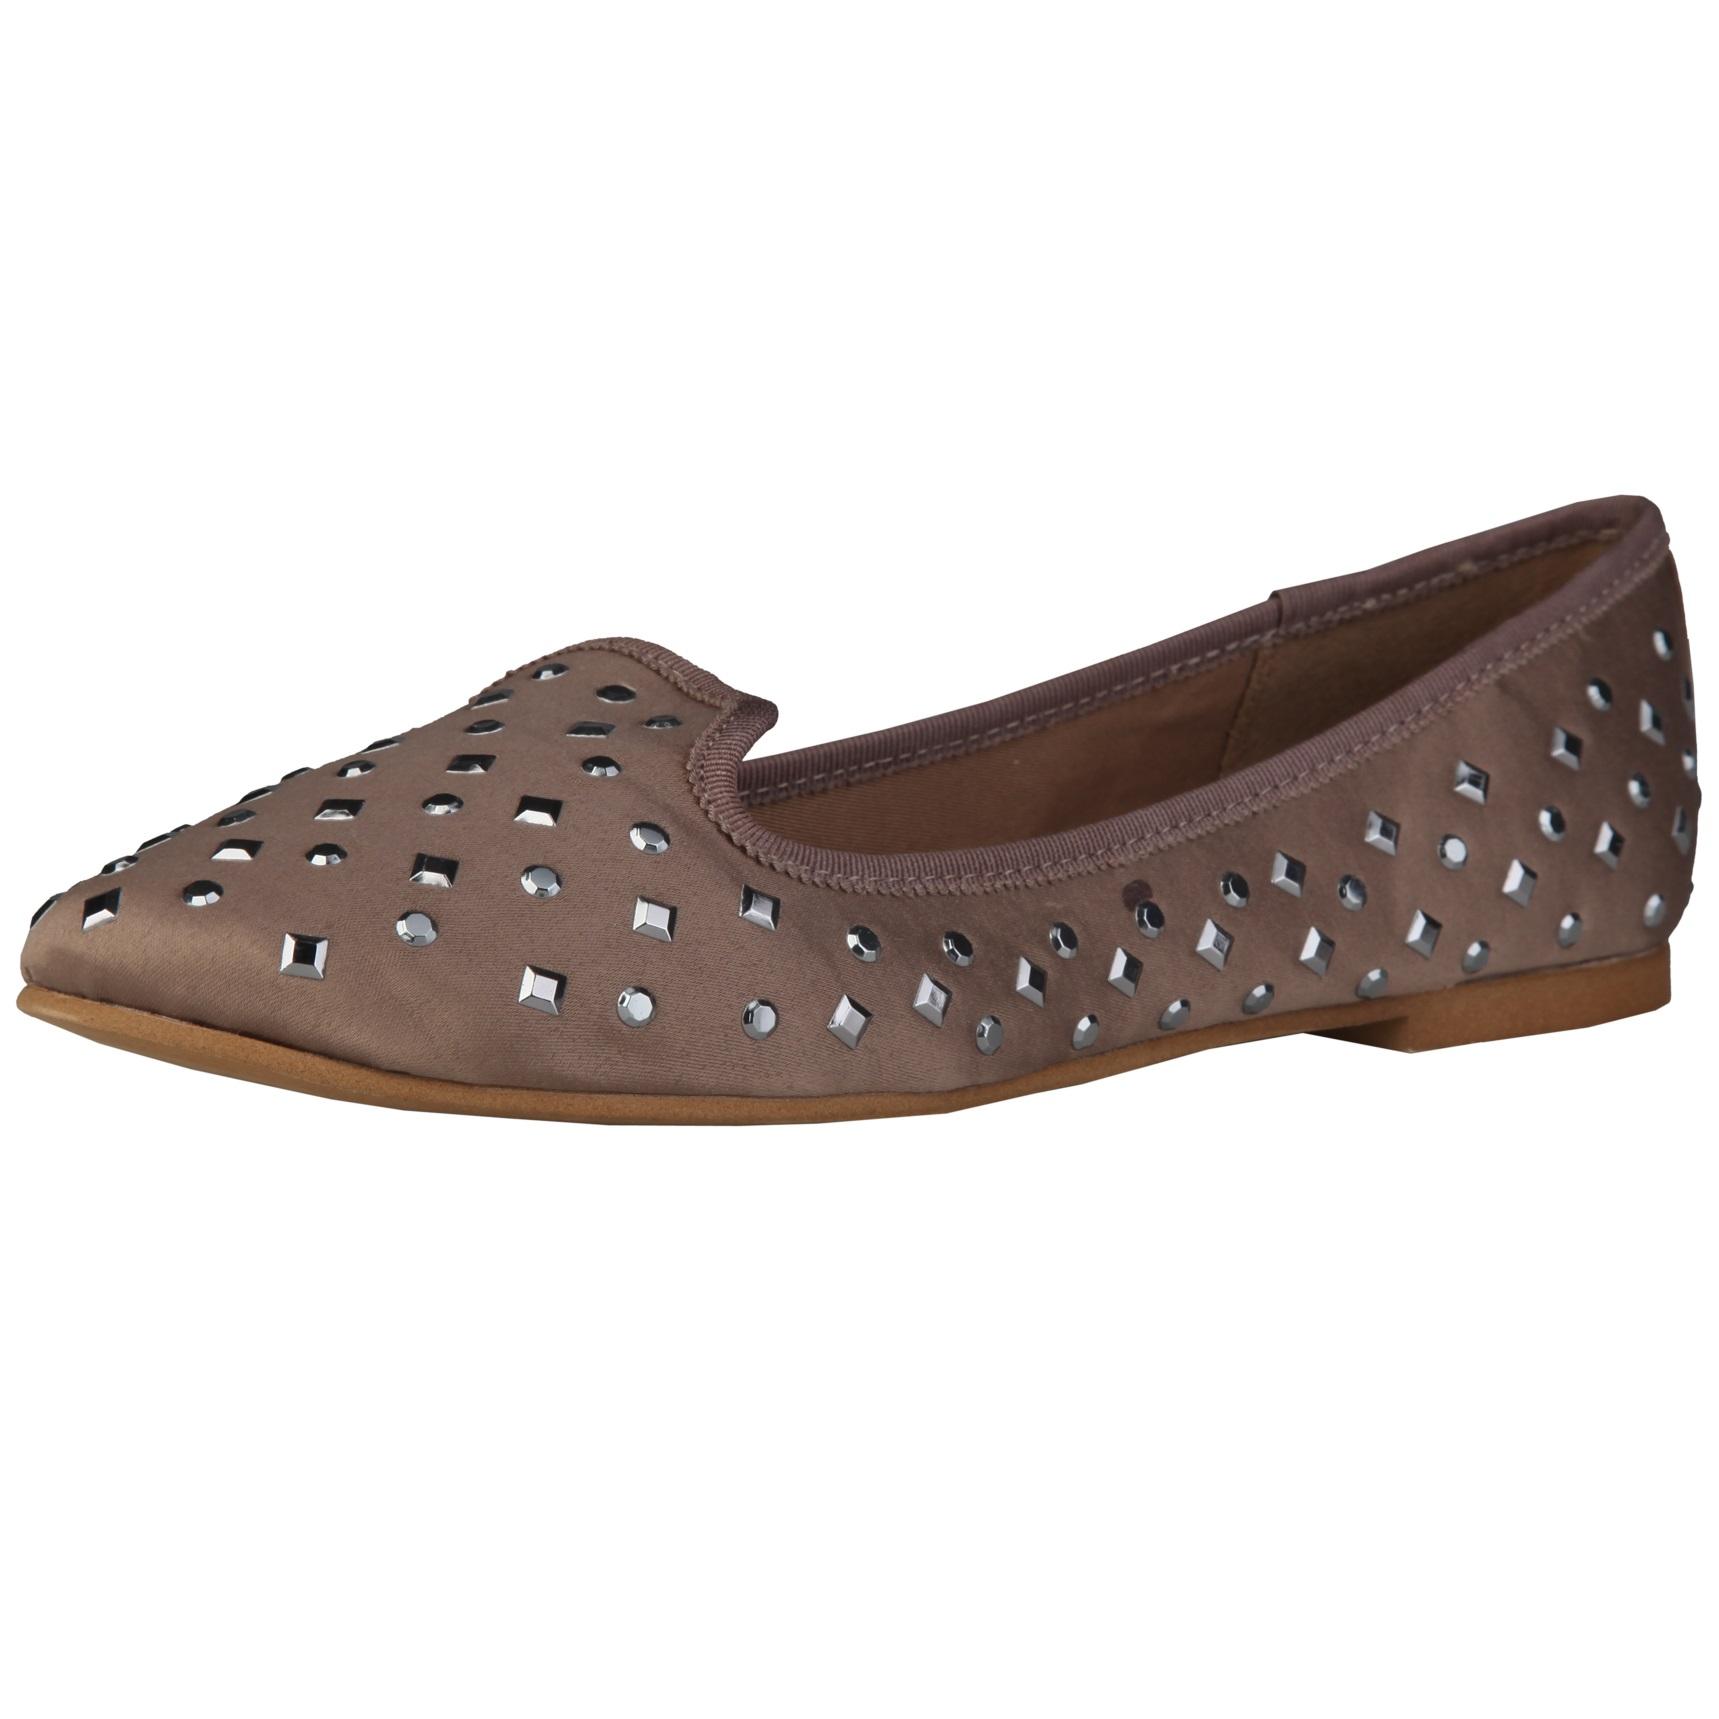 Sofia Loes Flat Shoes Sabbia Rf600353